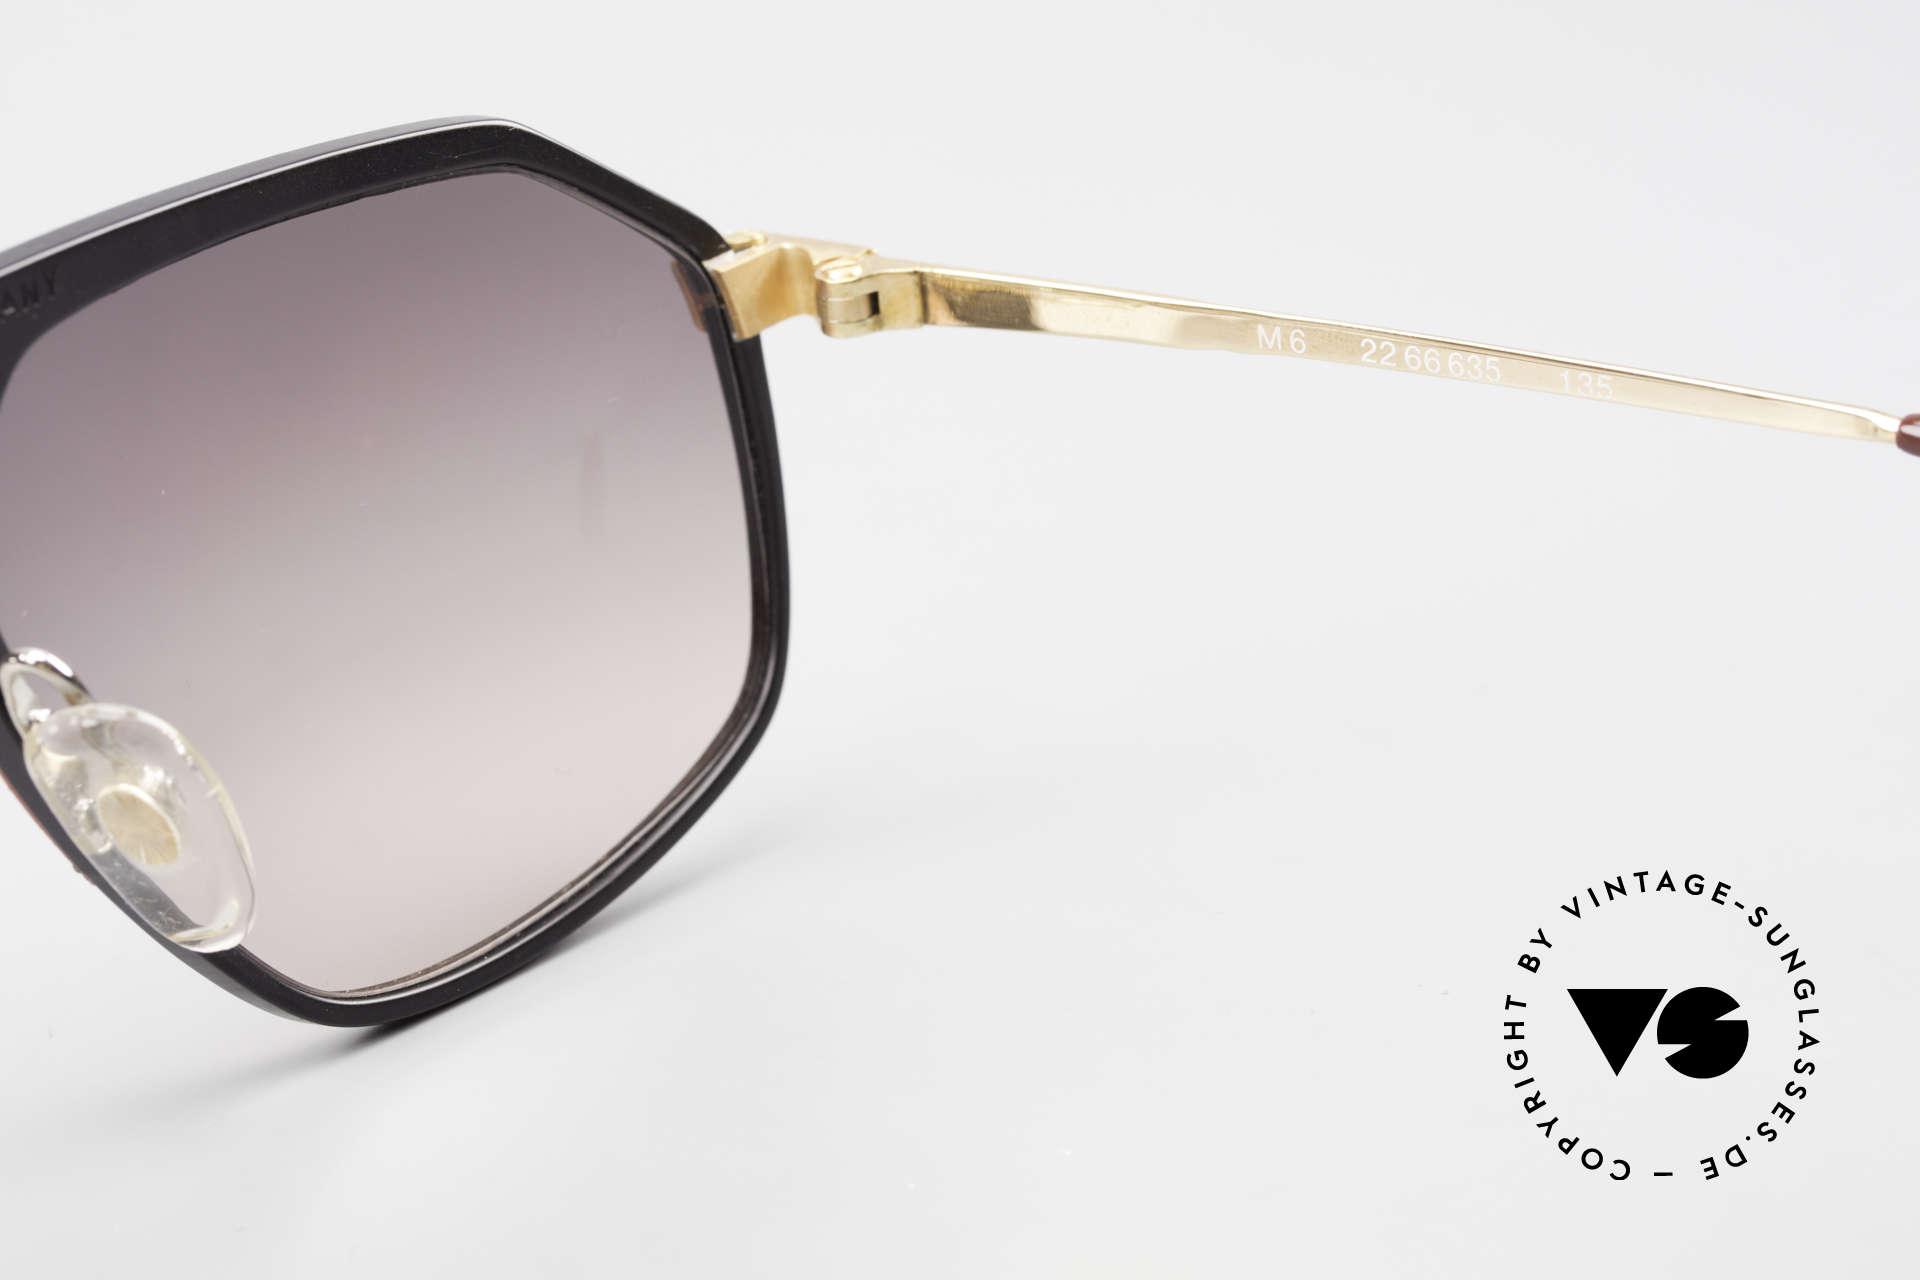 Alpina M6 Rare 80's Vintage Sunglasses, Size: medium, Made for Men and Women